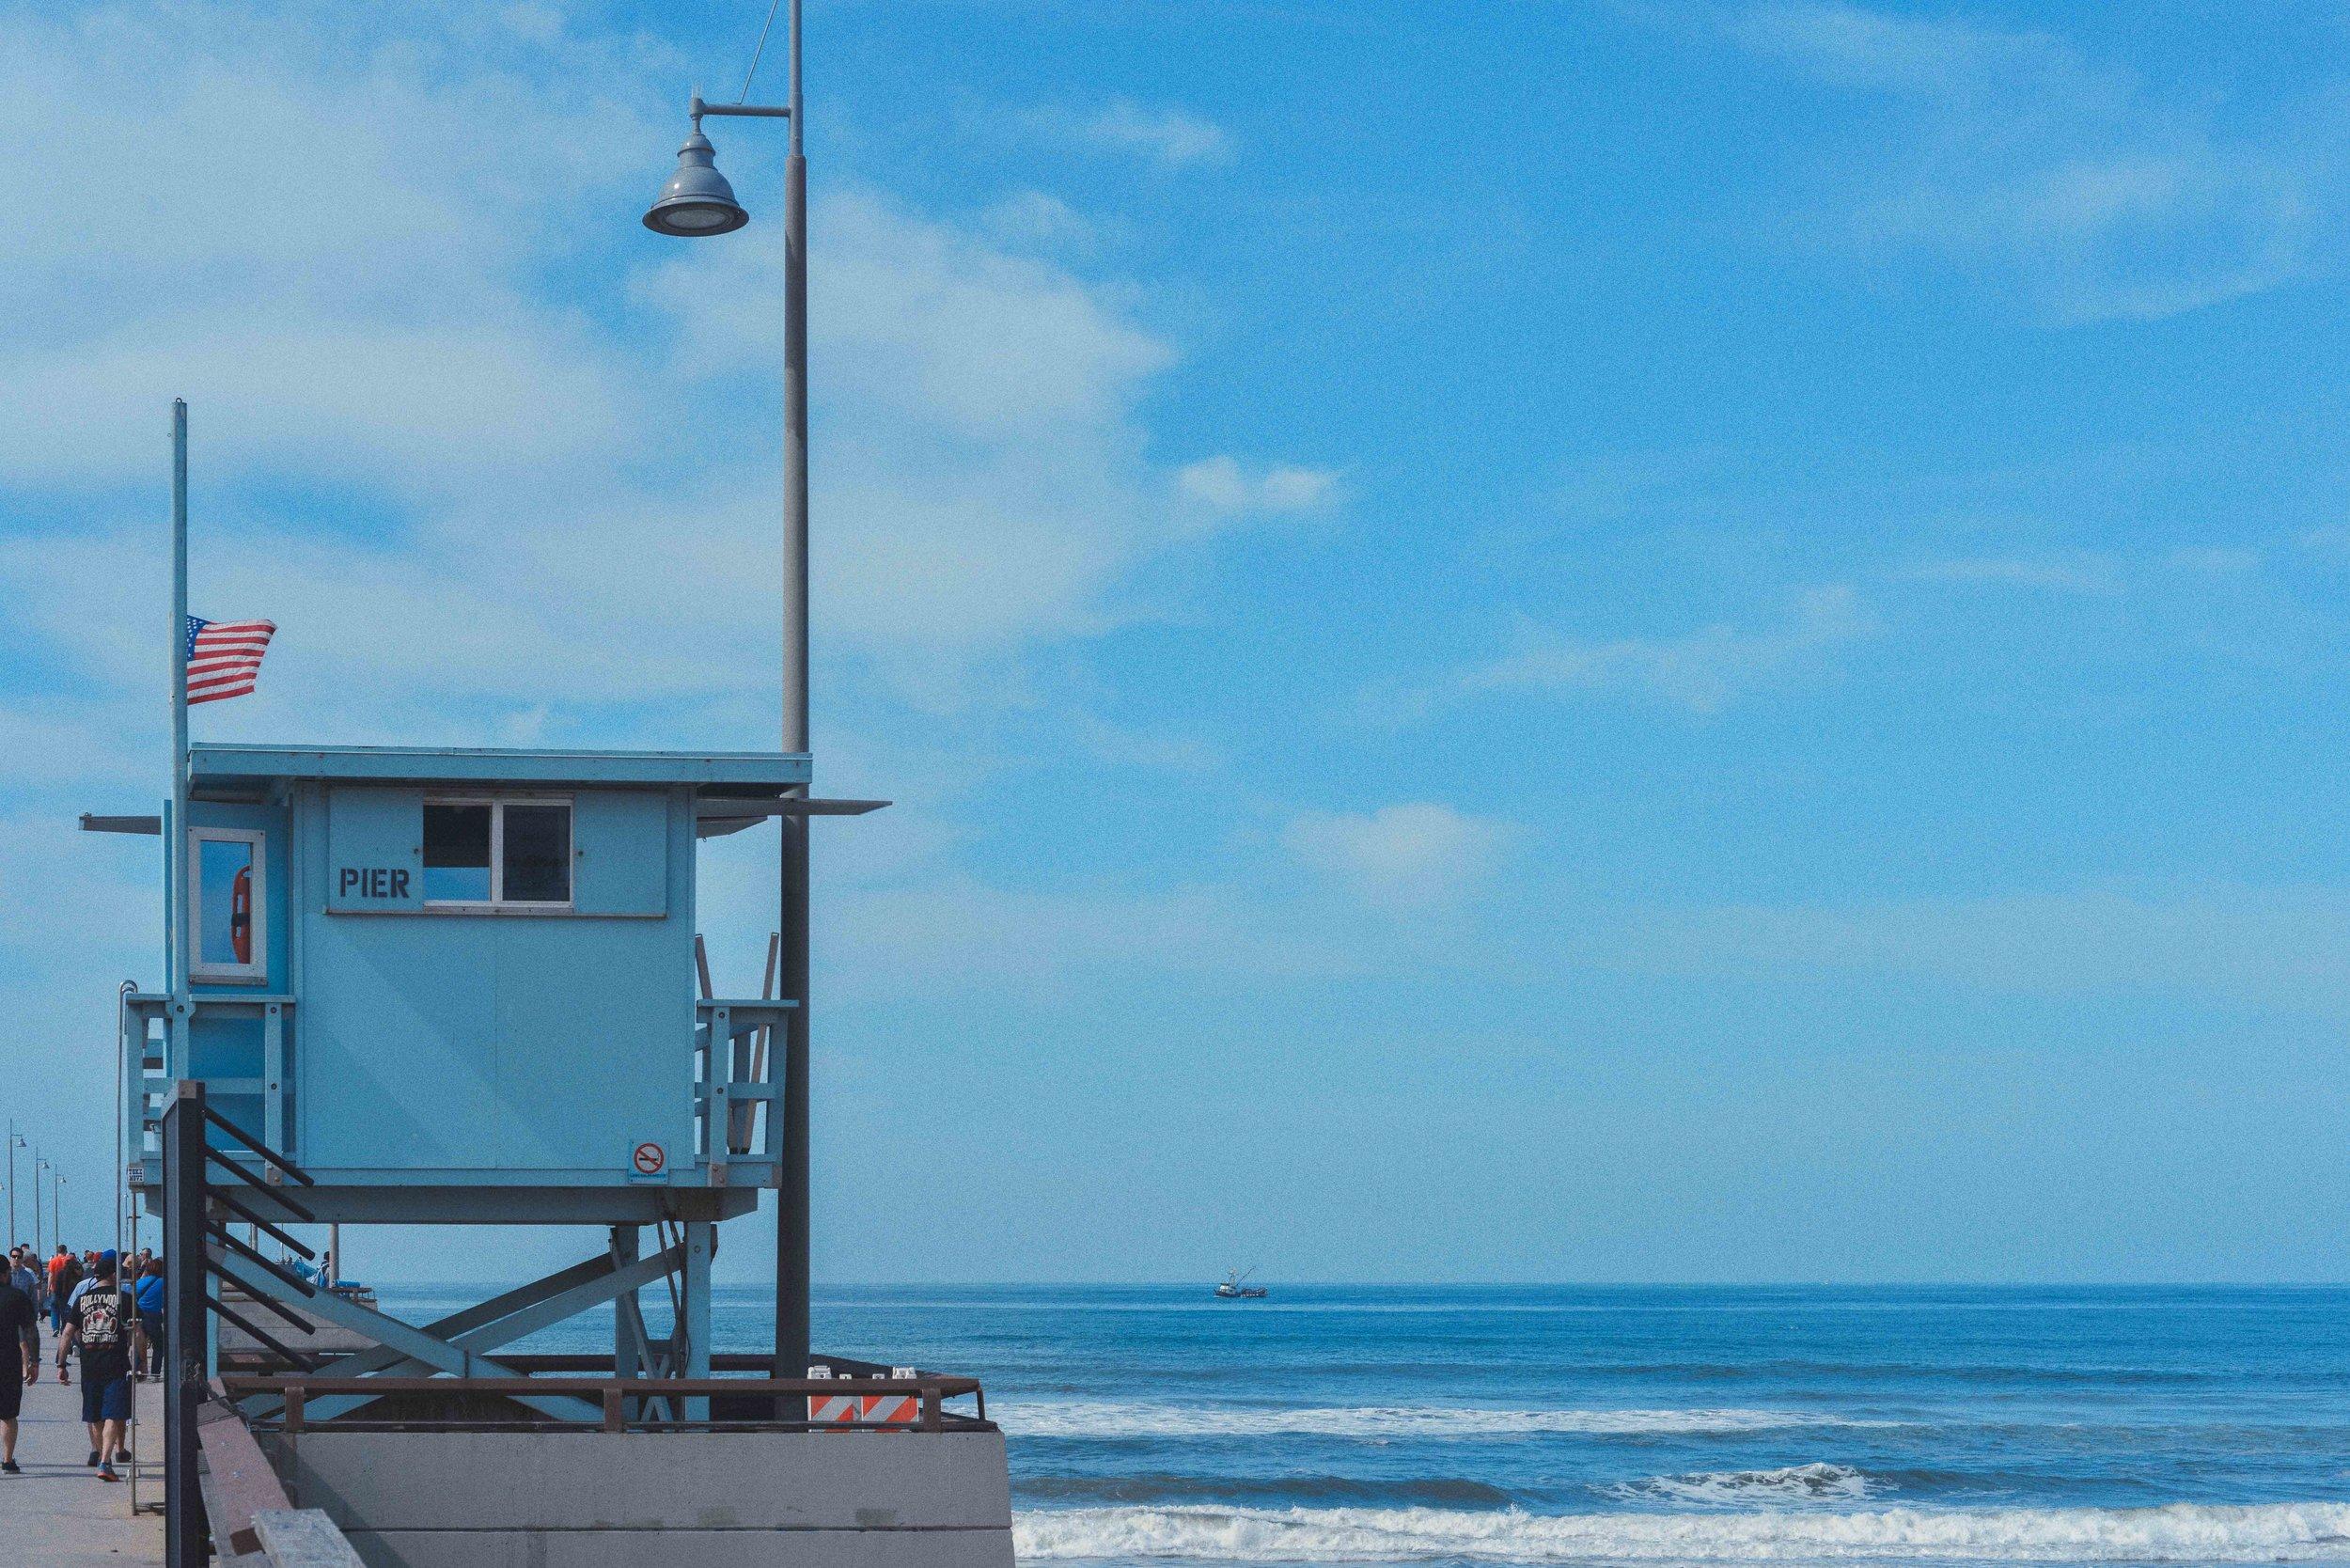 ryan thompson creative photography - lifeguard tower